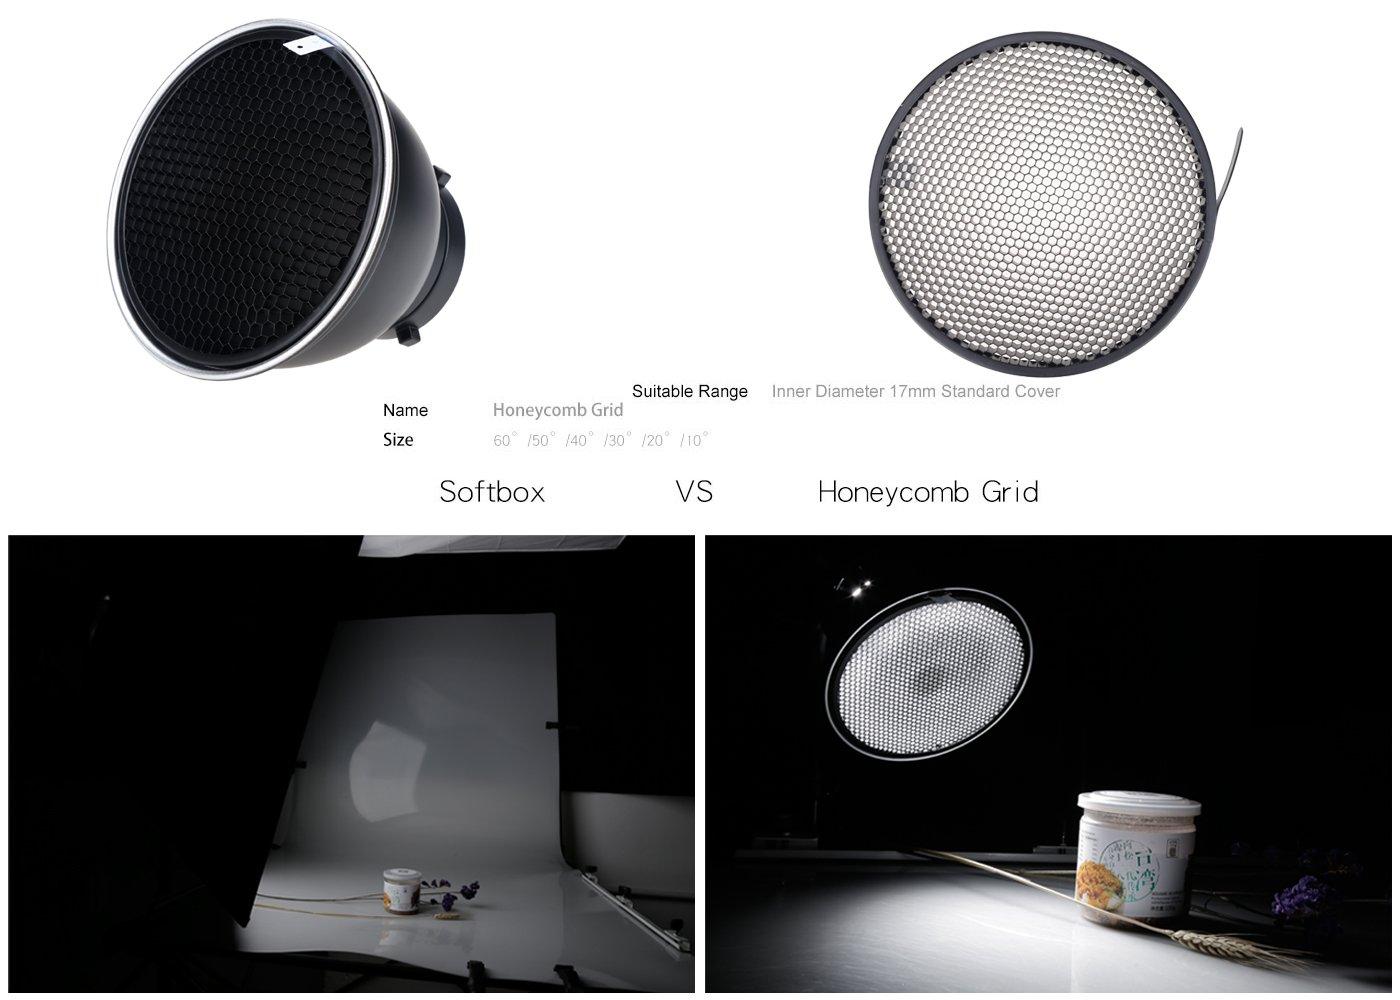 Godox Standard Reflector 7''/18cm Diffuser with 20/40/60 Degree Honeycomb Grid for Bowens Mount Studio Light Strobe Flash by Godox (Image #4)